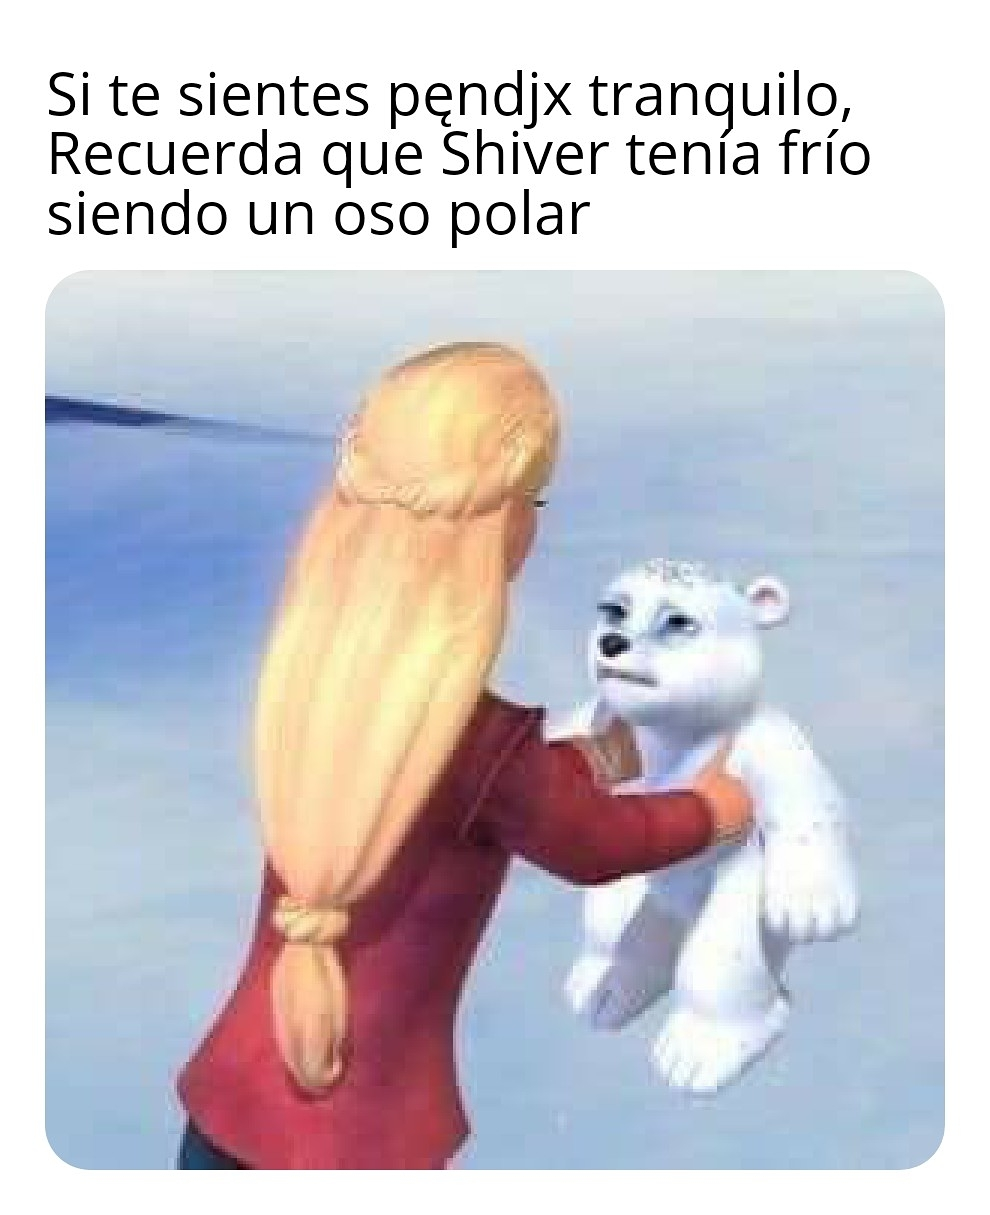 Si te sientes pendjx tranquilo, recuerda que Shiver tenla frío siendo un oso polar.